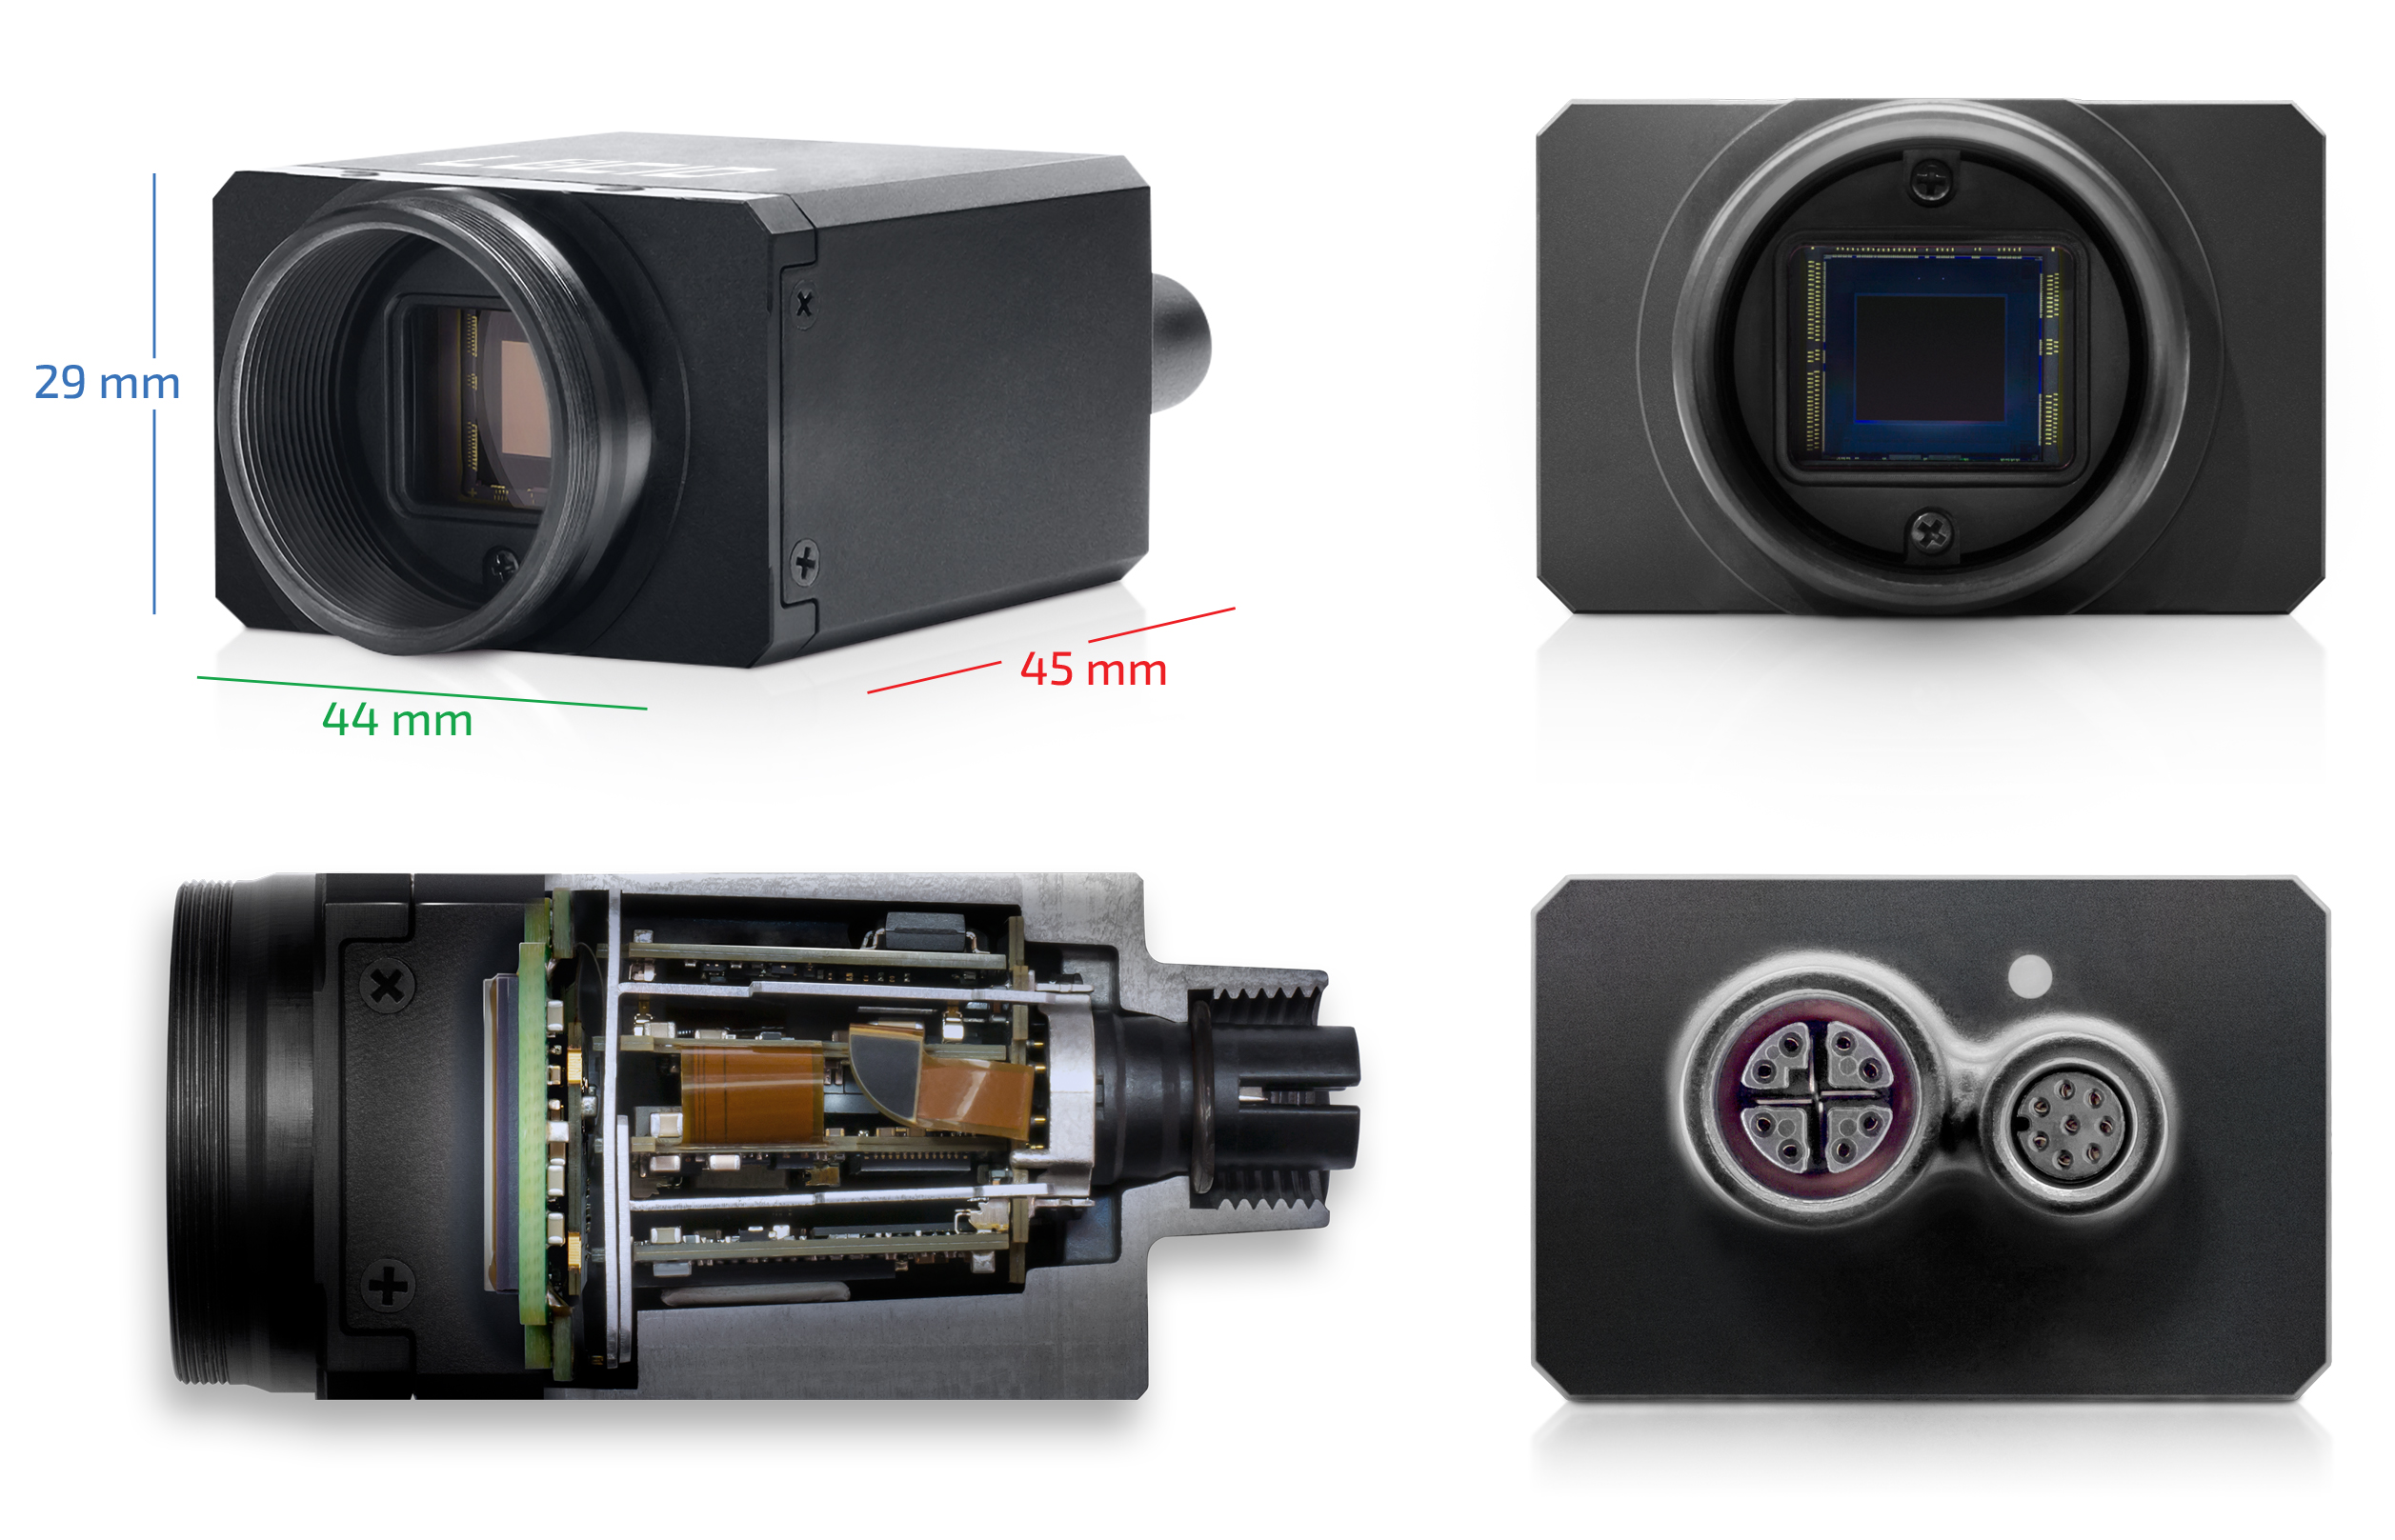 Triton Edge Camera with Xilinx UltraScale+ MPSoC